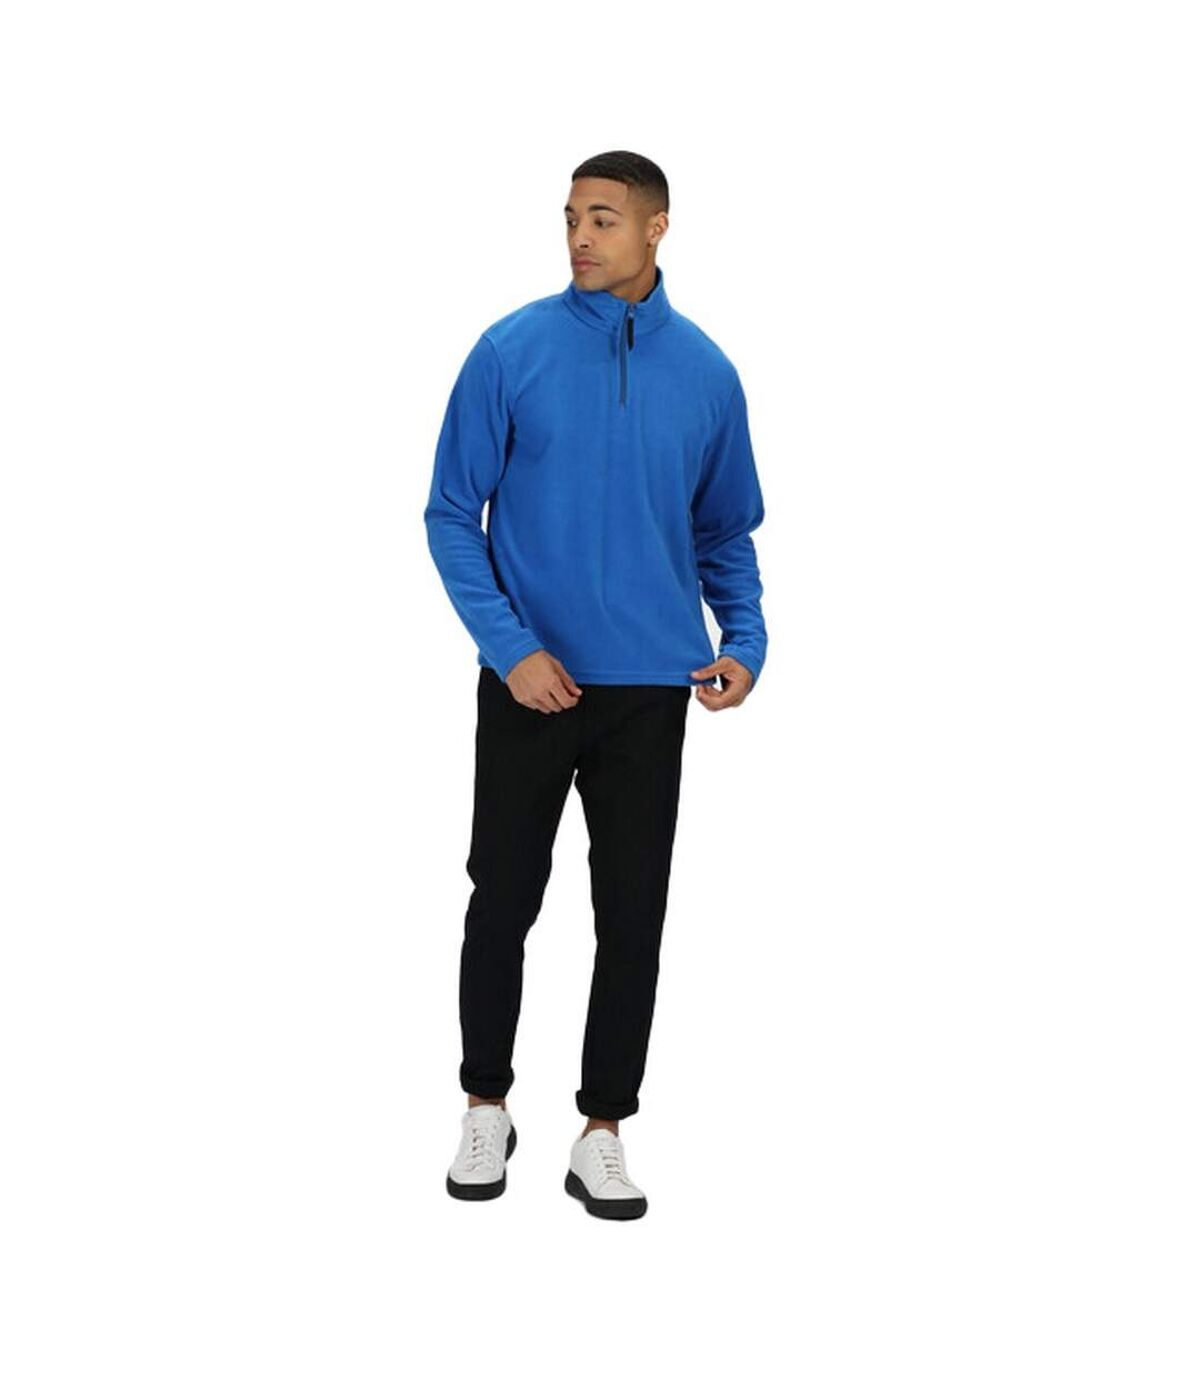 Regatta - Polaire - Homme (Bleu) - UTRG1580